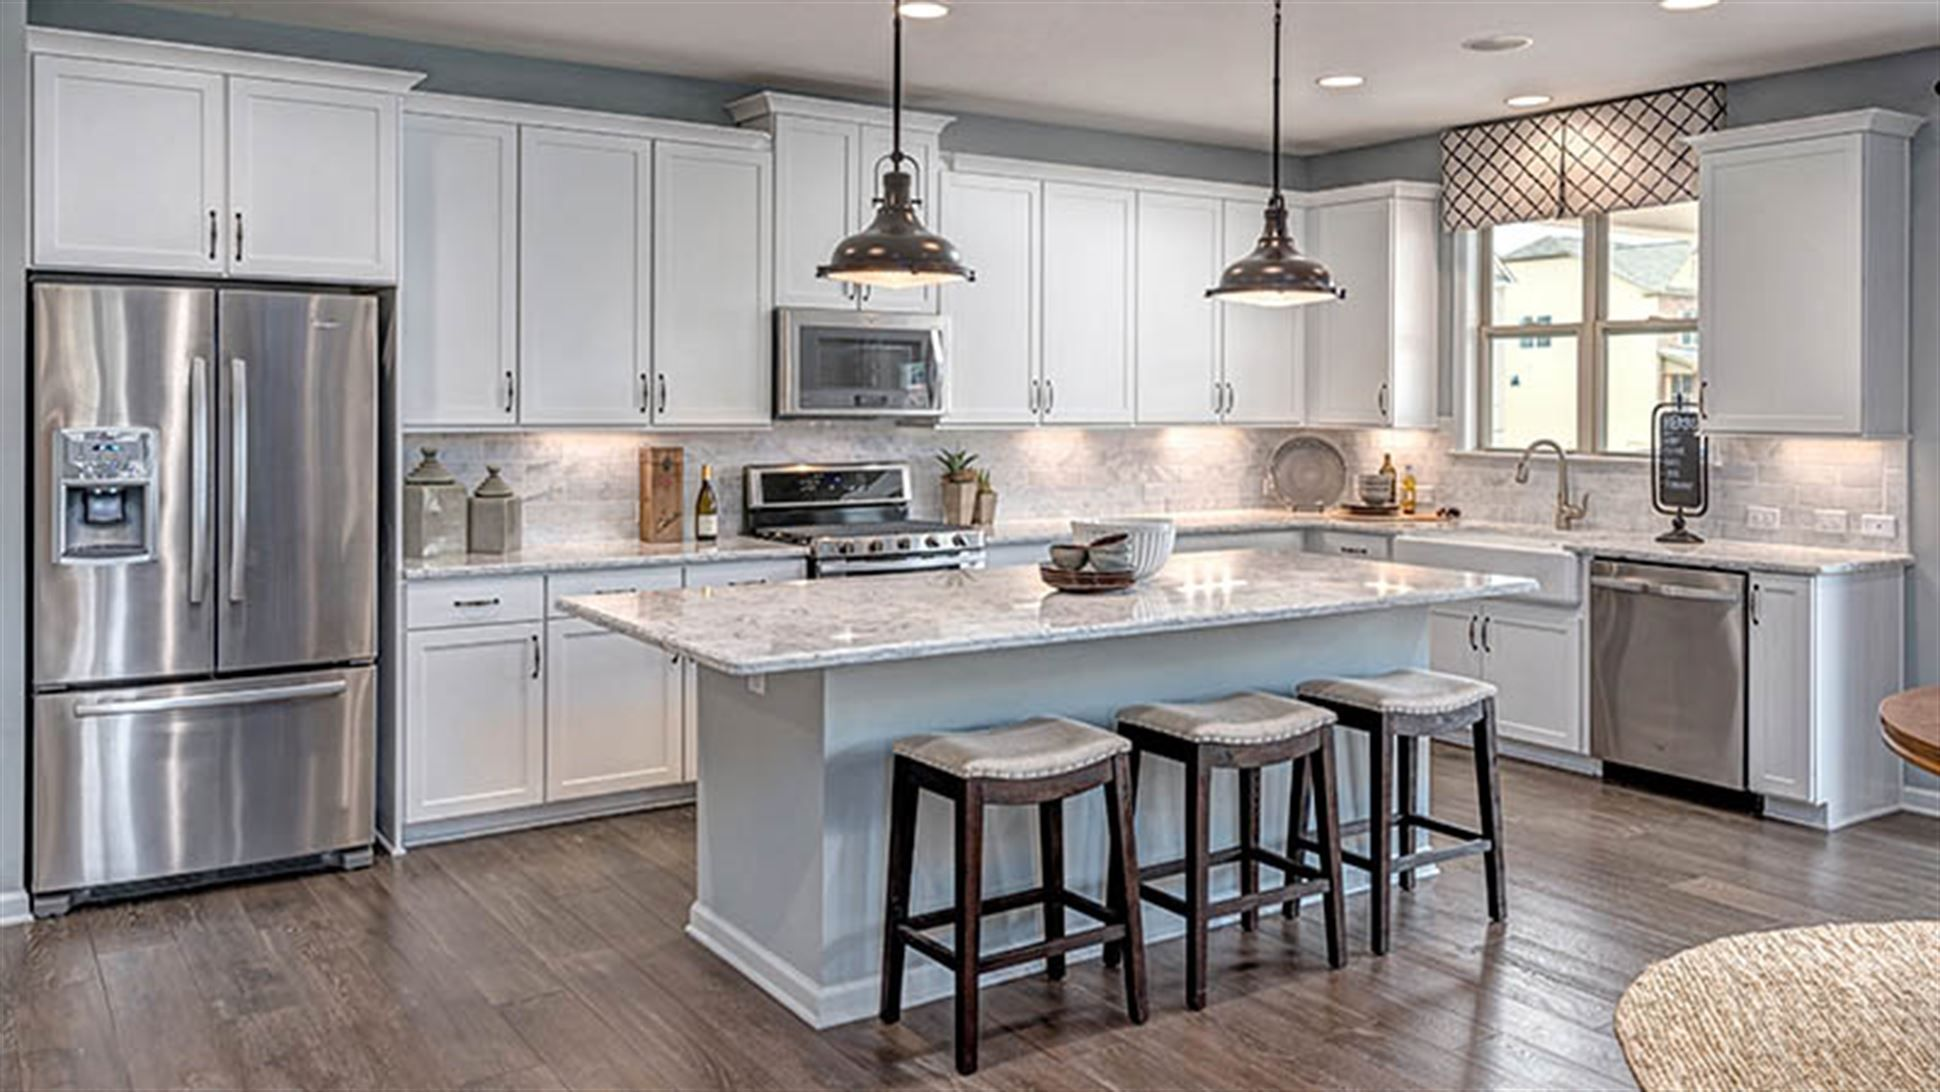 CalAtlantic Homes East Highlands community in Lilburn, GA ...